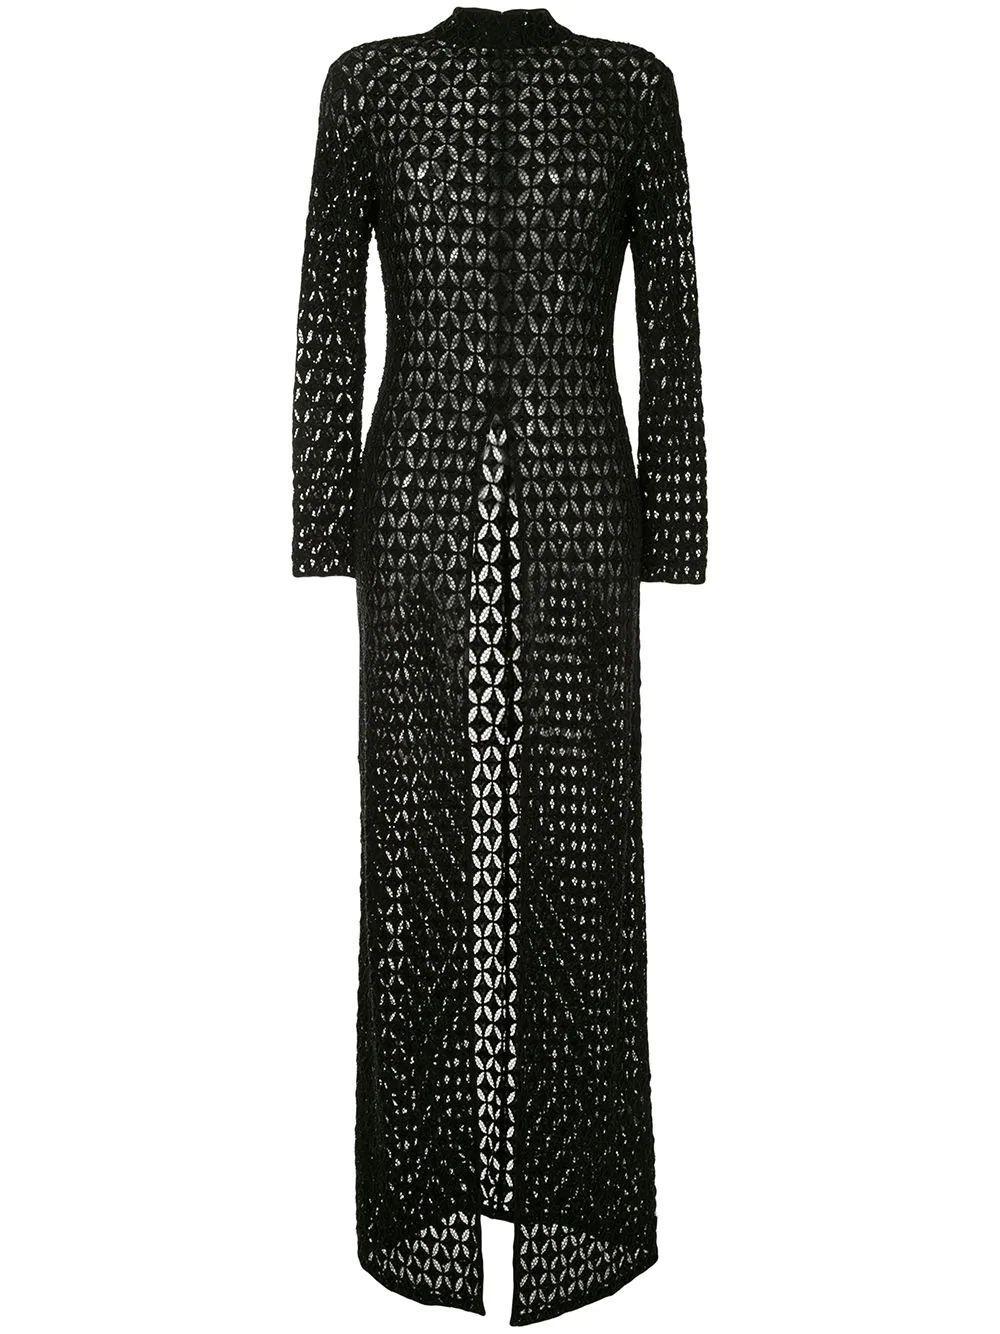 Poppy Sequin Dress